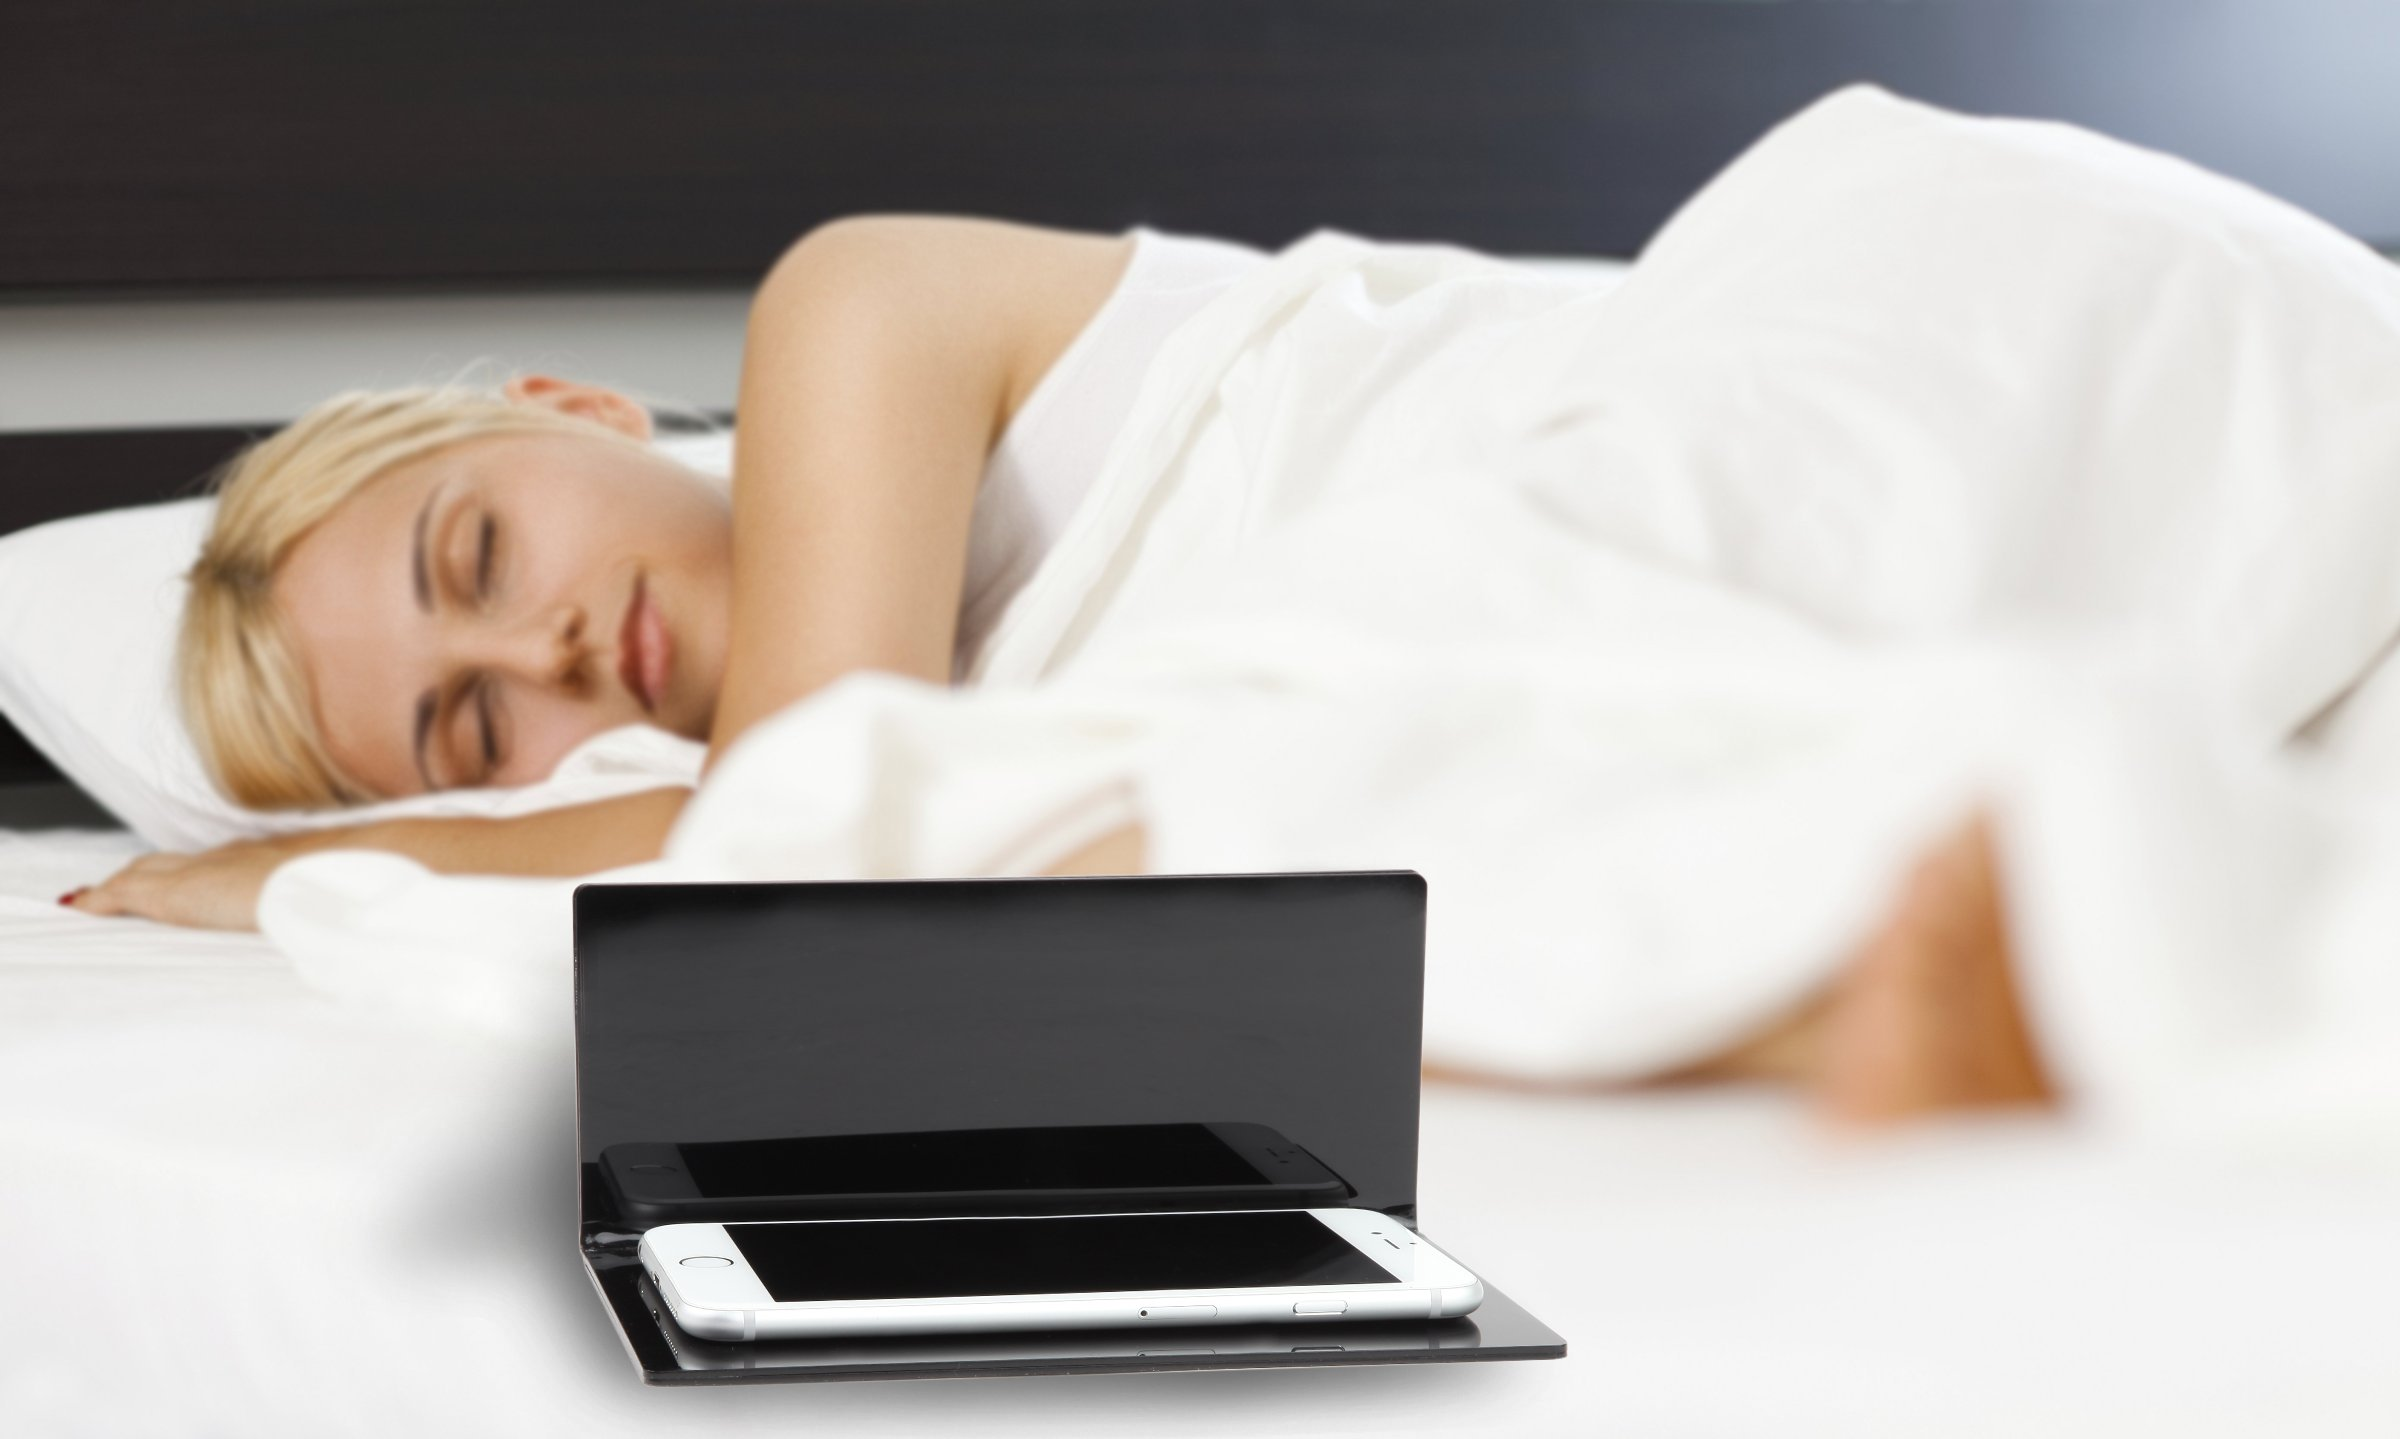 Cell Phone Sleep Shield - EMF Radiation Shield - HARApad EMF Protection by HARApad (Image #2)